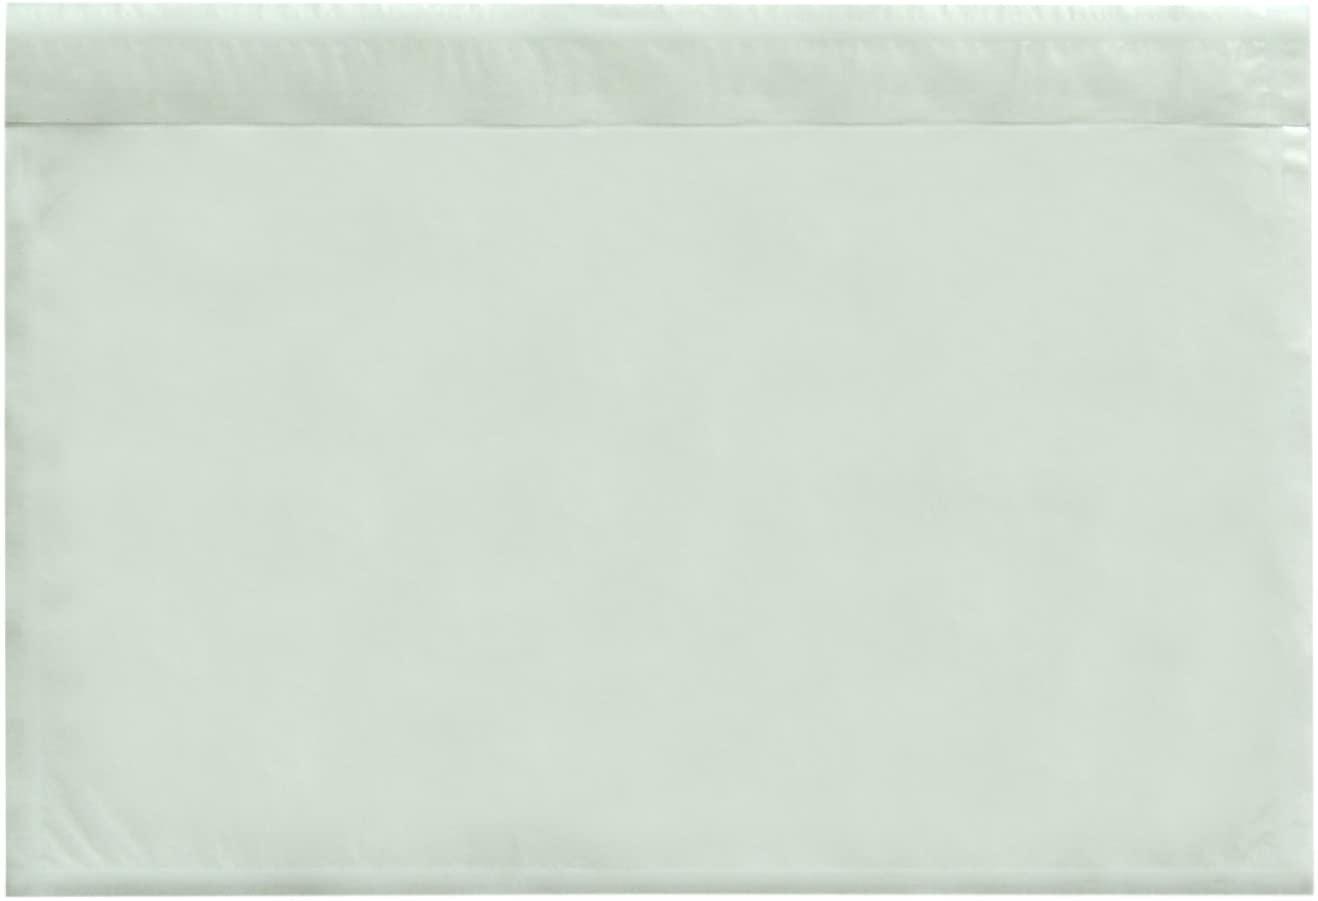 Card dozio Envelope Self-Adhesive Document, 1000Pieces